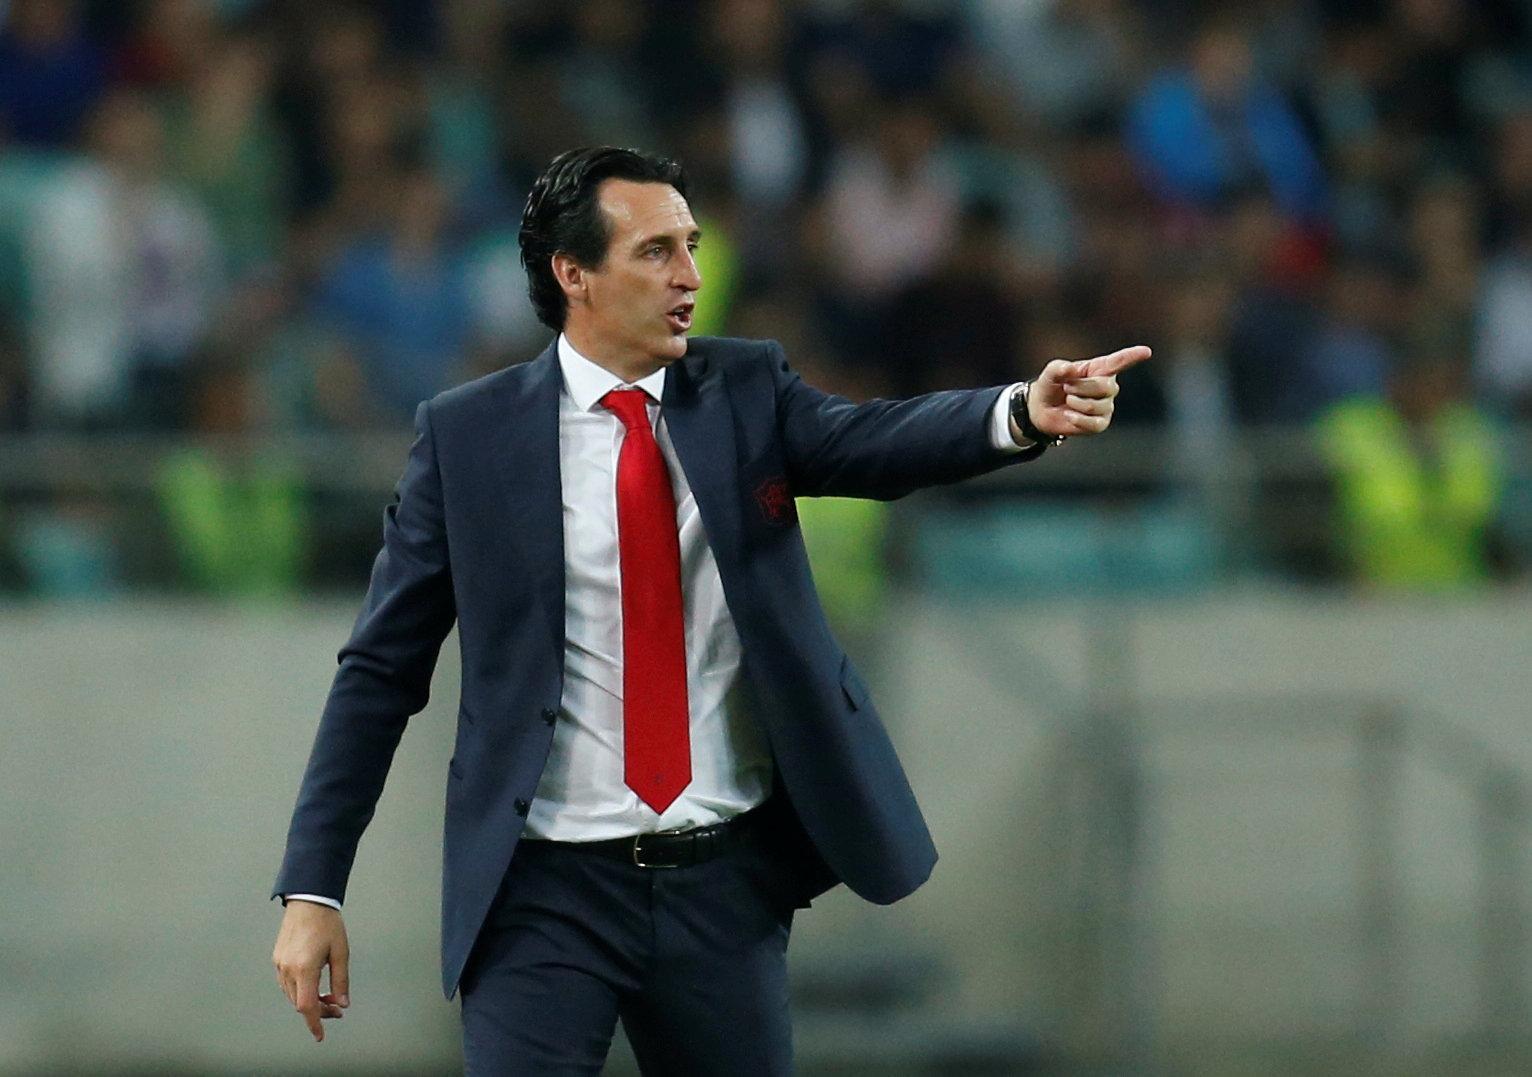 Unai Emery has had time to settle at Arsenal - thanks to Jose Mourinho, says Ian Wright